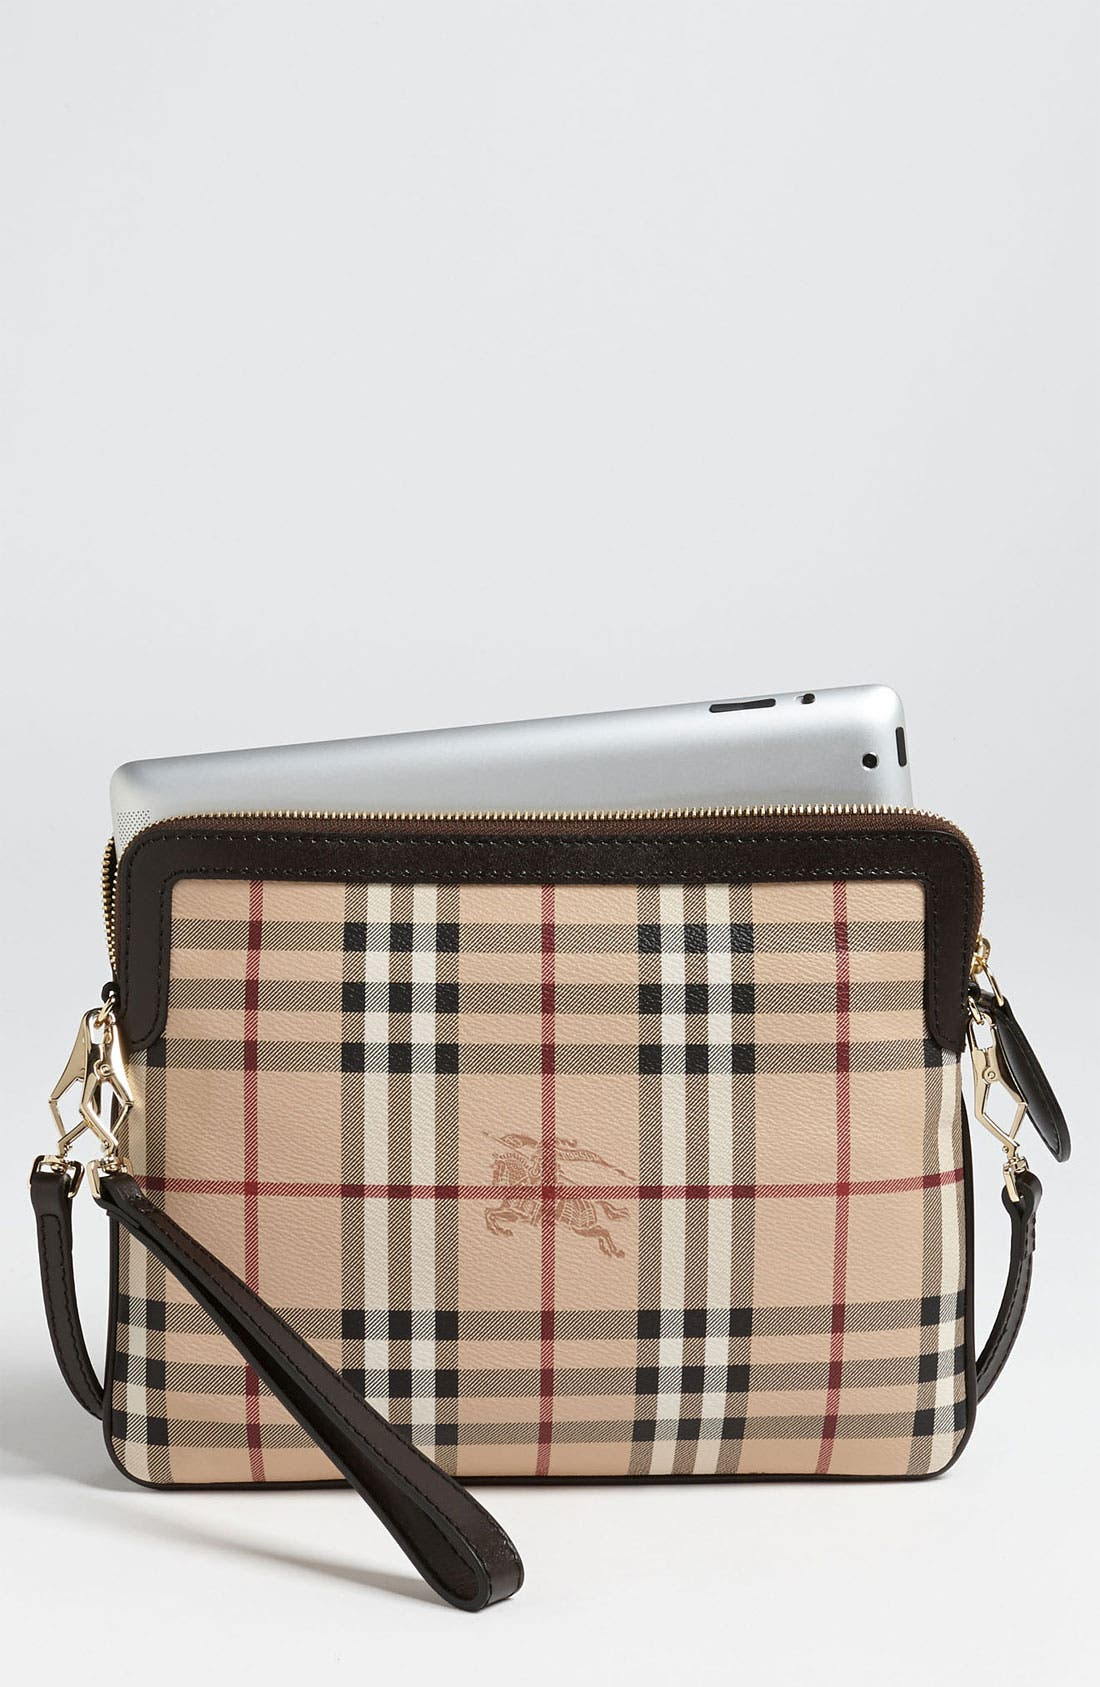 Main Image - Burberry 'Haymarket Check' iPad Crossbody Bag